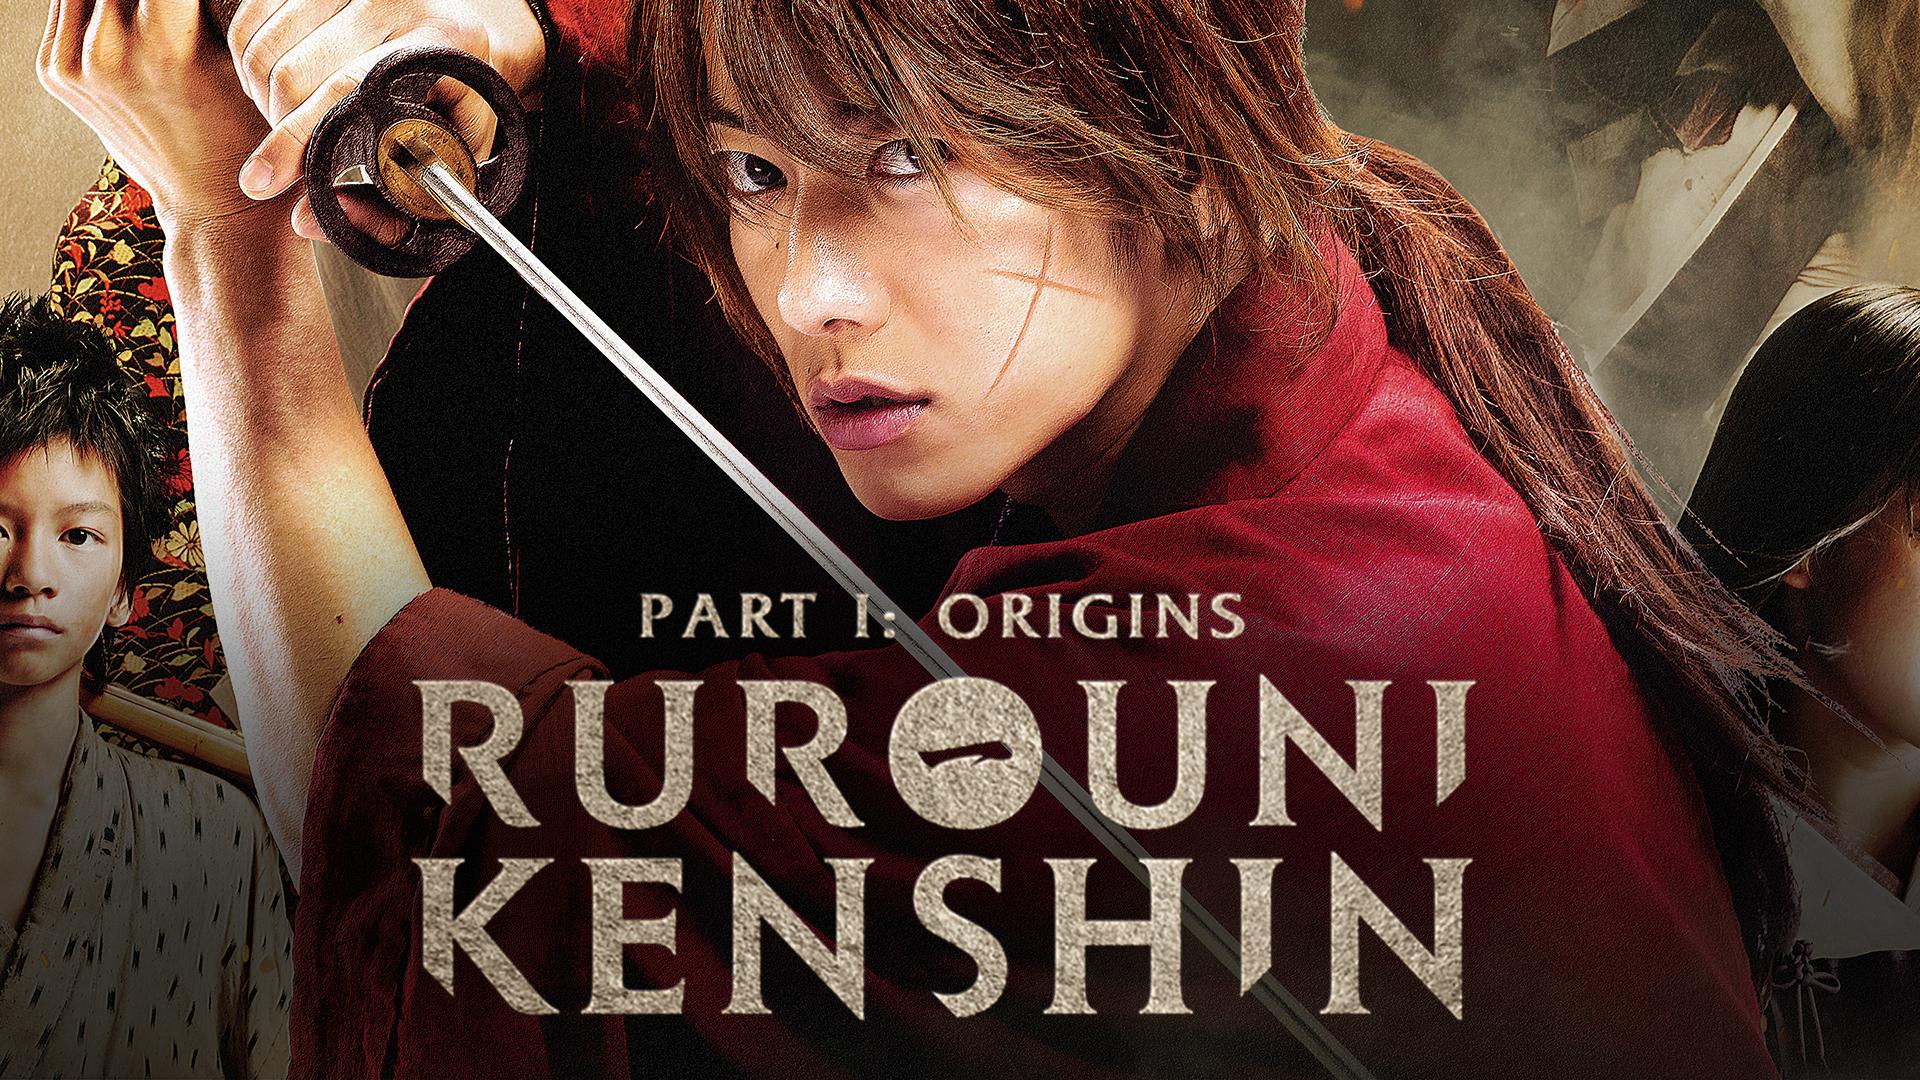 Rurouni Kenshin - Part I: Origins (Original Japanese Version)